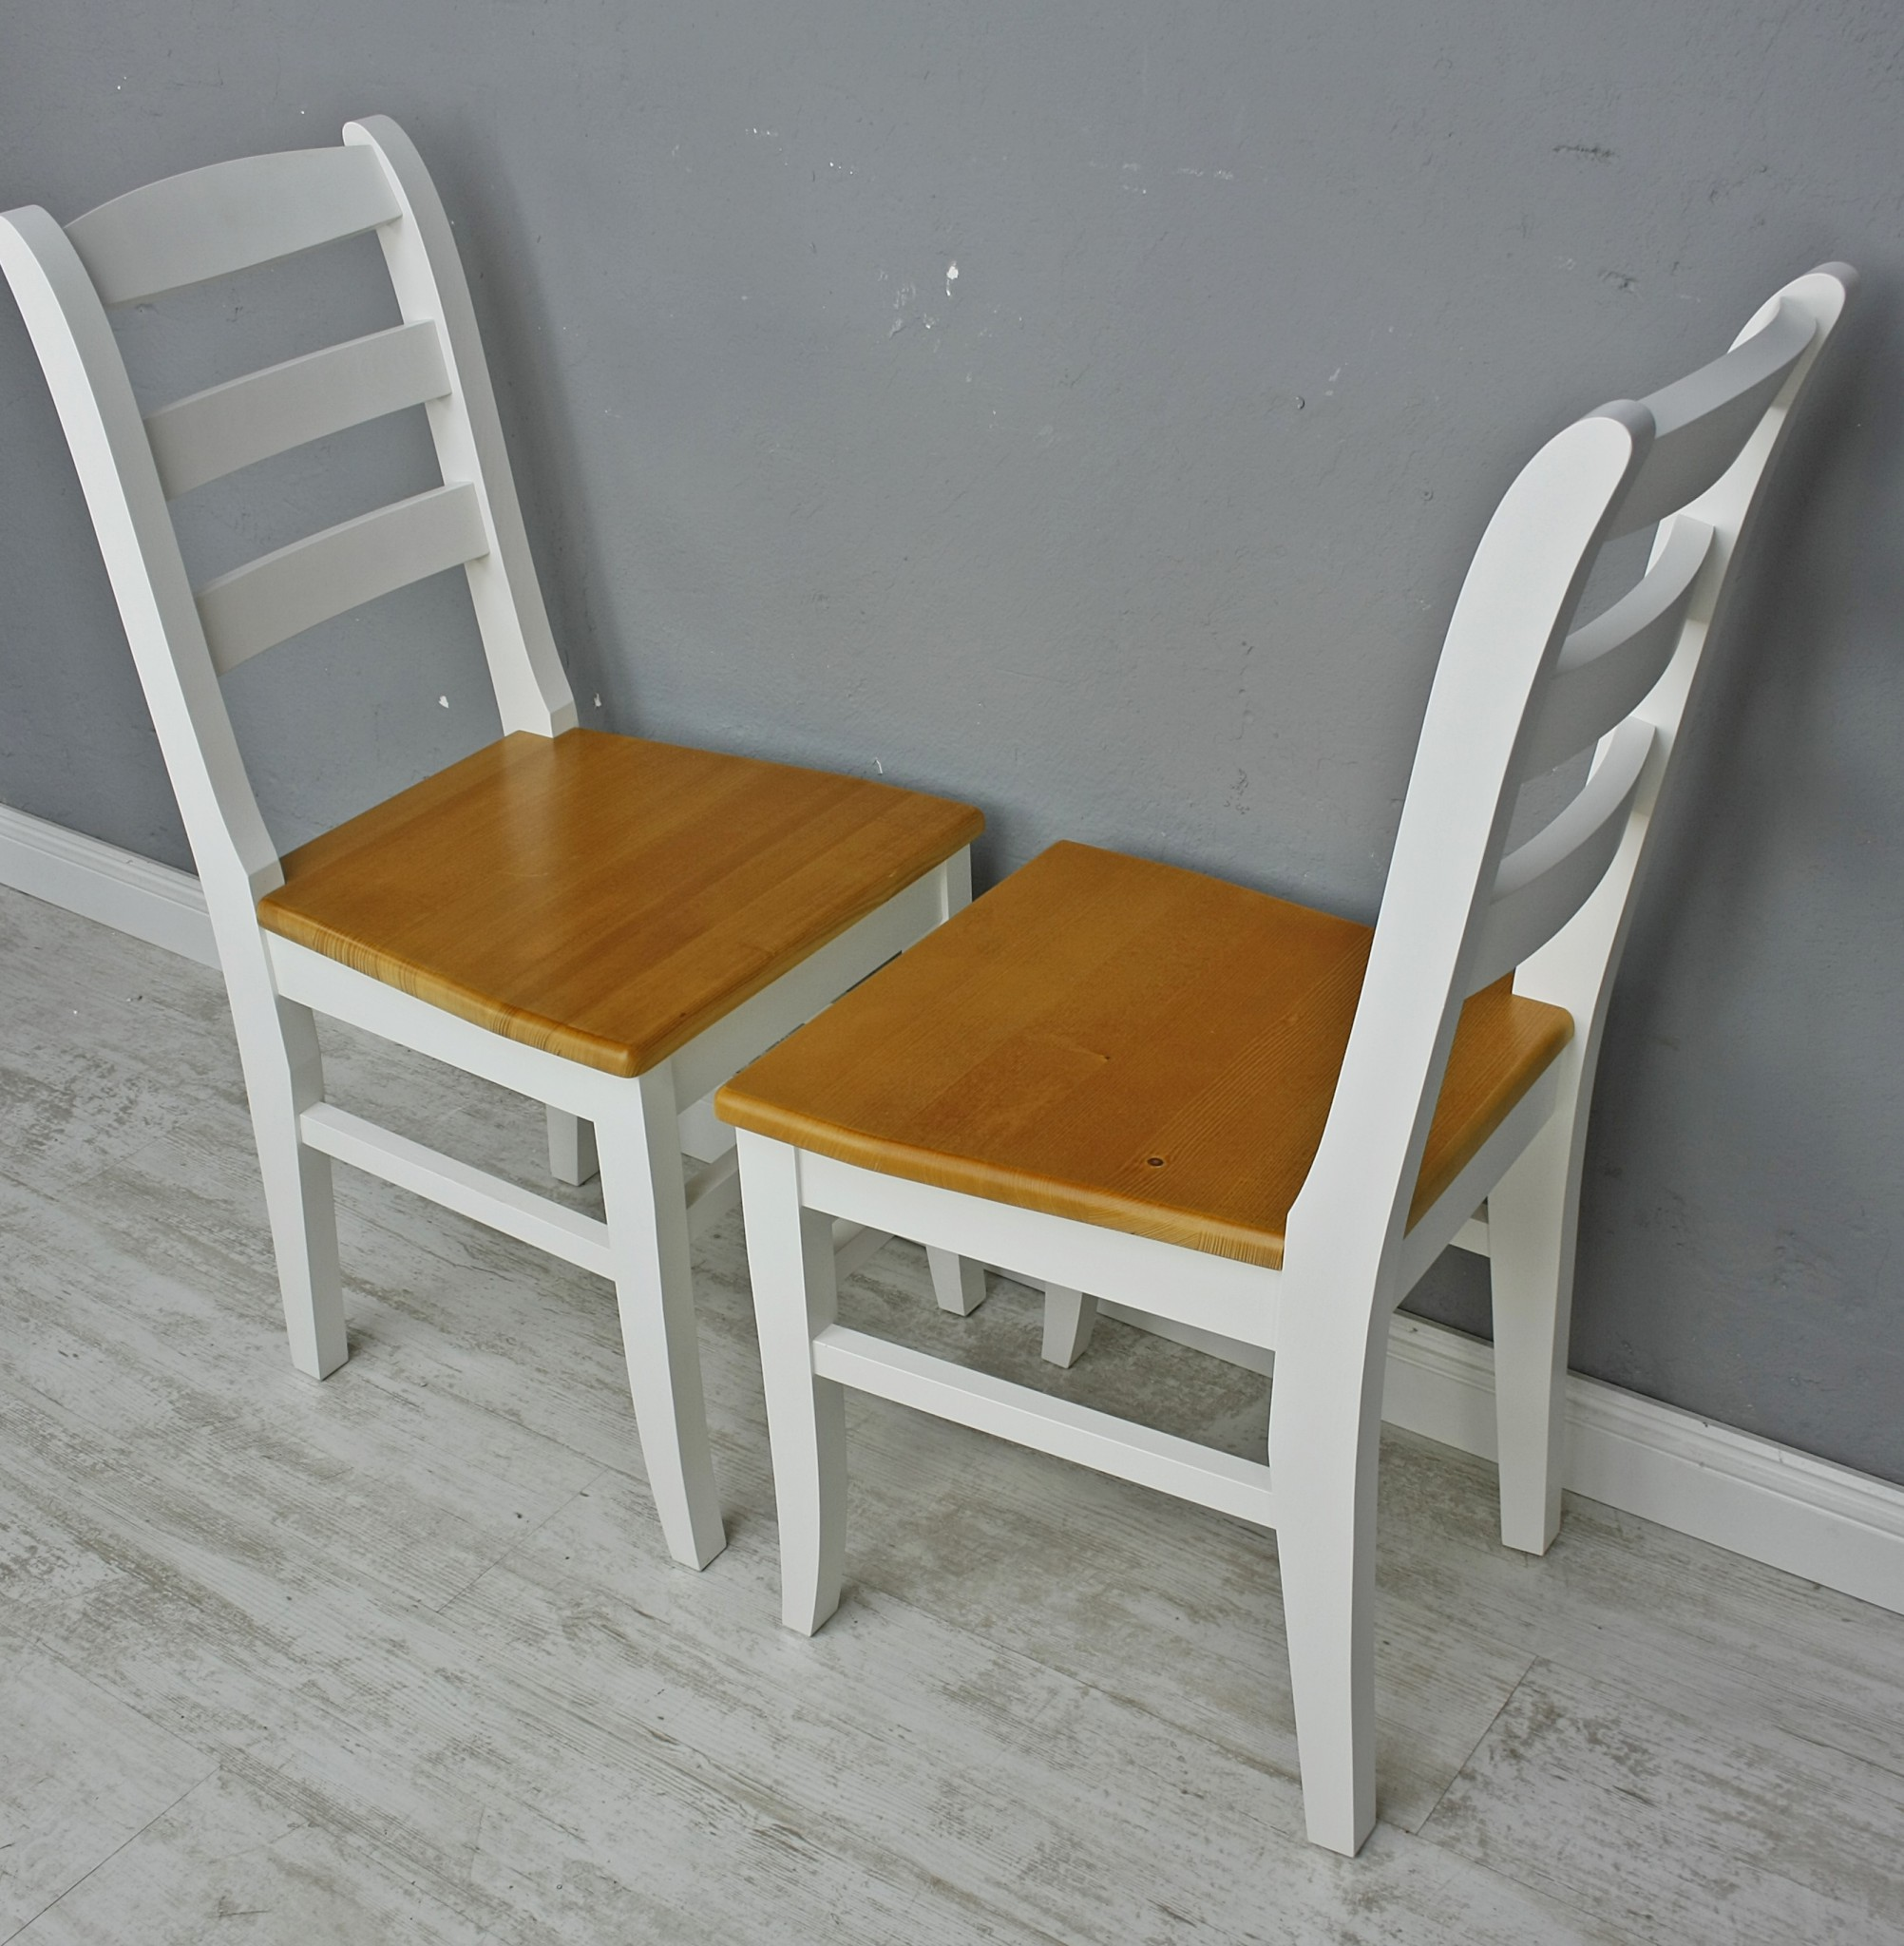 2x Stuhl Holzstuhl Küchenstuhl LENA Massiv Weiß Braun Holz